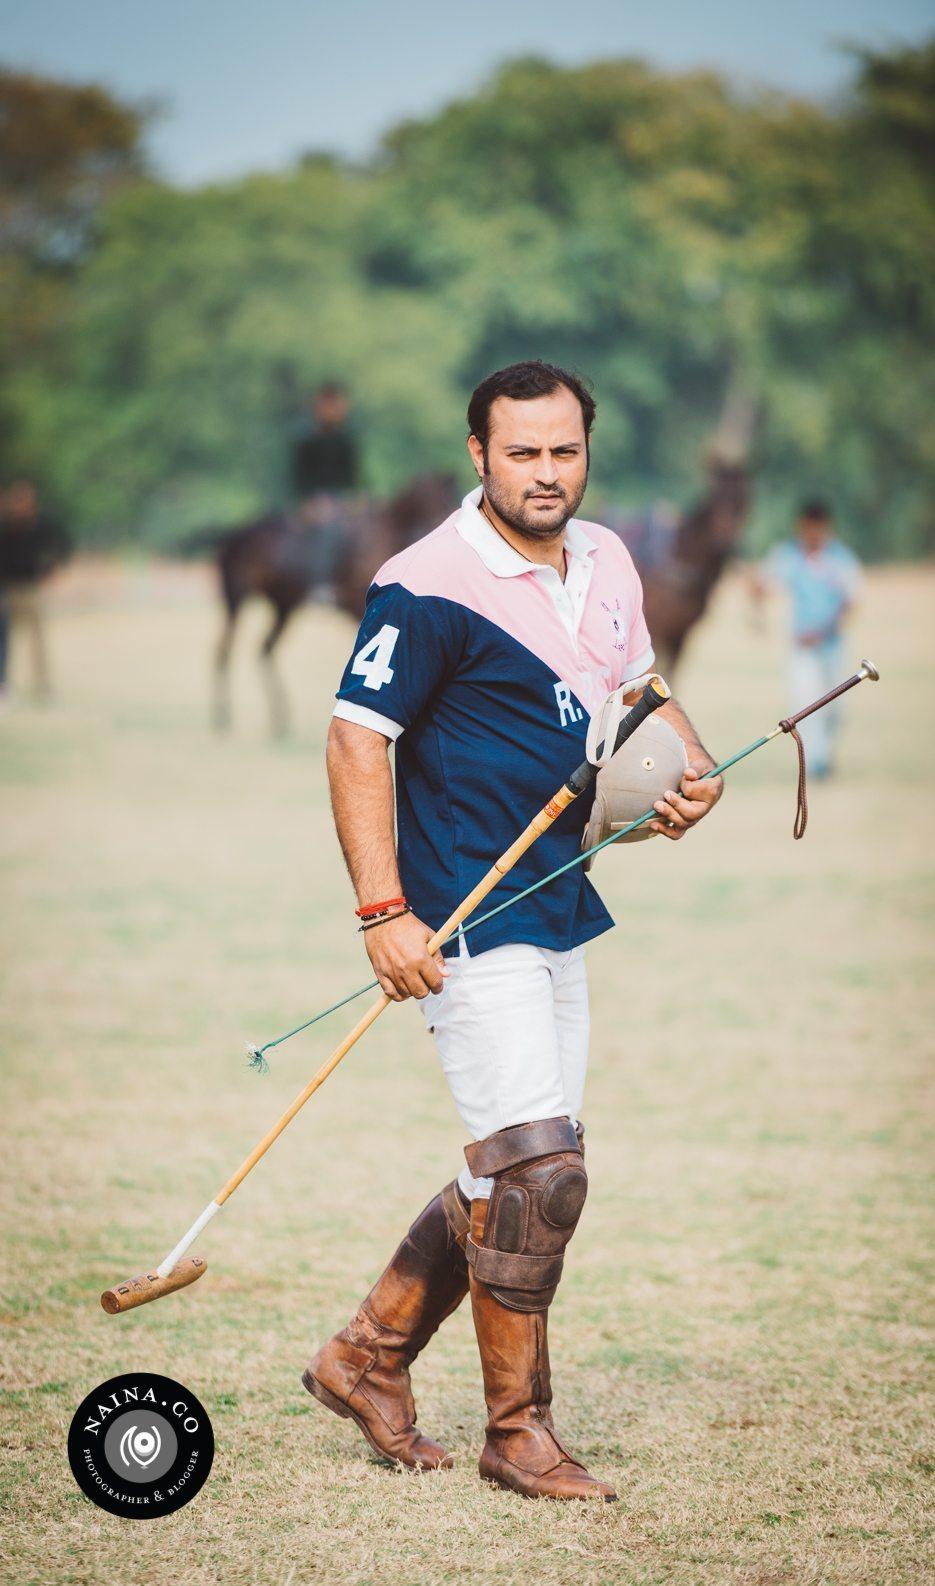 Naina.co-Raconteuse-Visuelle-Photographer-Blogger-Storyteller-Luxury-Lifestyle-January-2015-St.Regis-Polo-Cup-Maharaja-Jaipur-EyesForStreetStyle-09